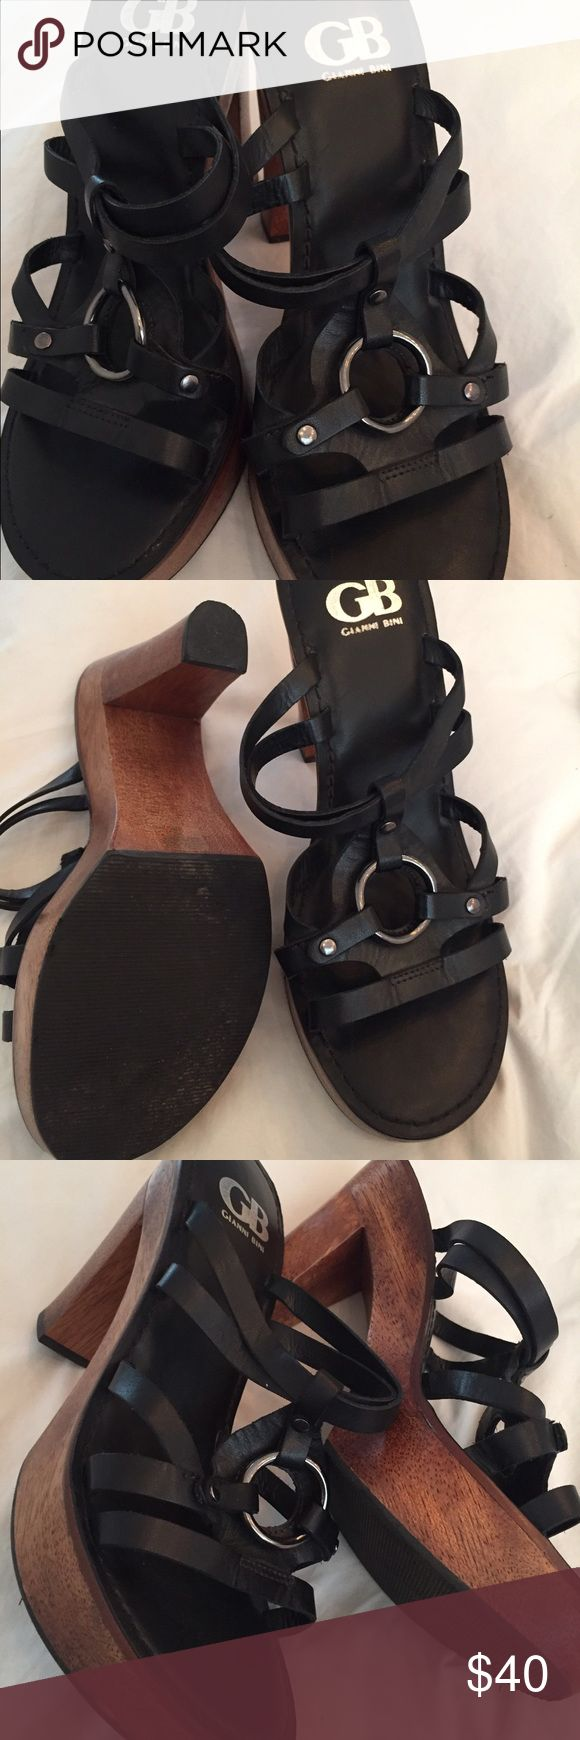 Amazing Gianni bini brand new! Wood heeled sandal Amazing Gianni bini brand new! Wood heeled sandal! Gianni Bini Shoes Sandals